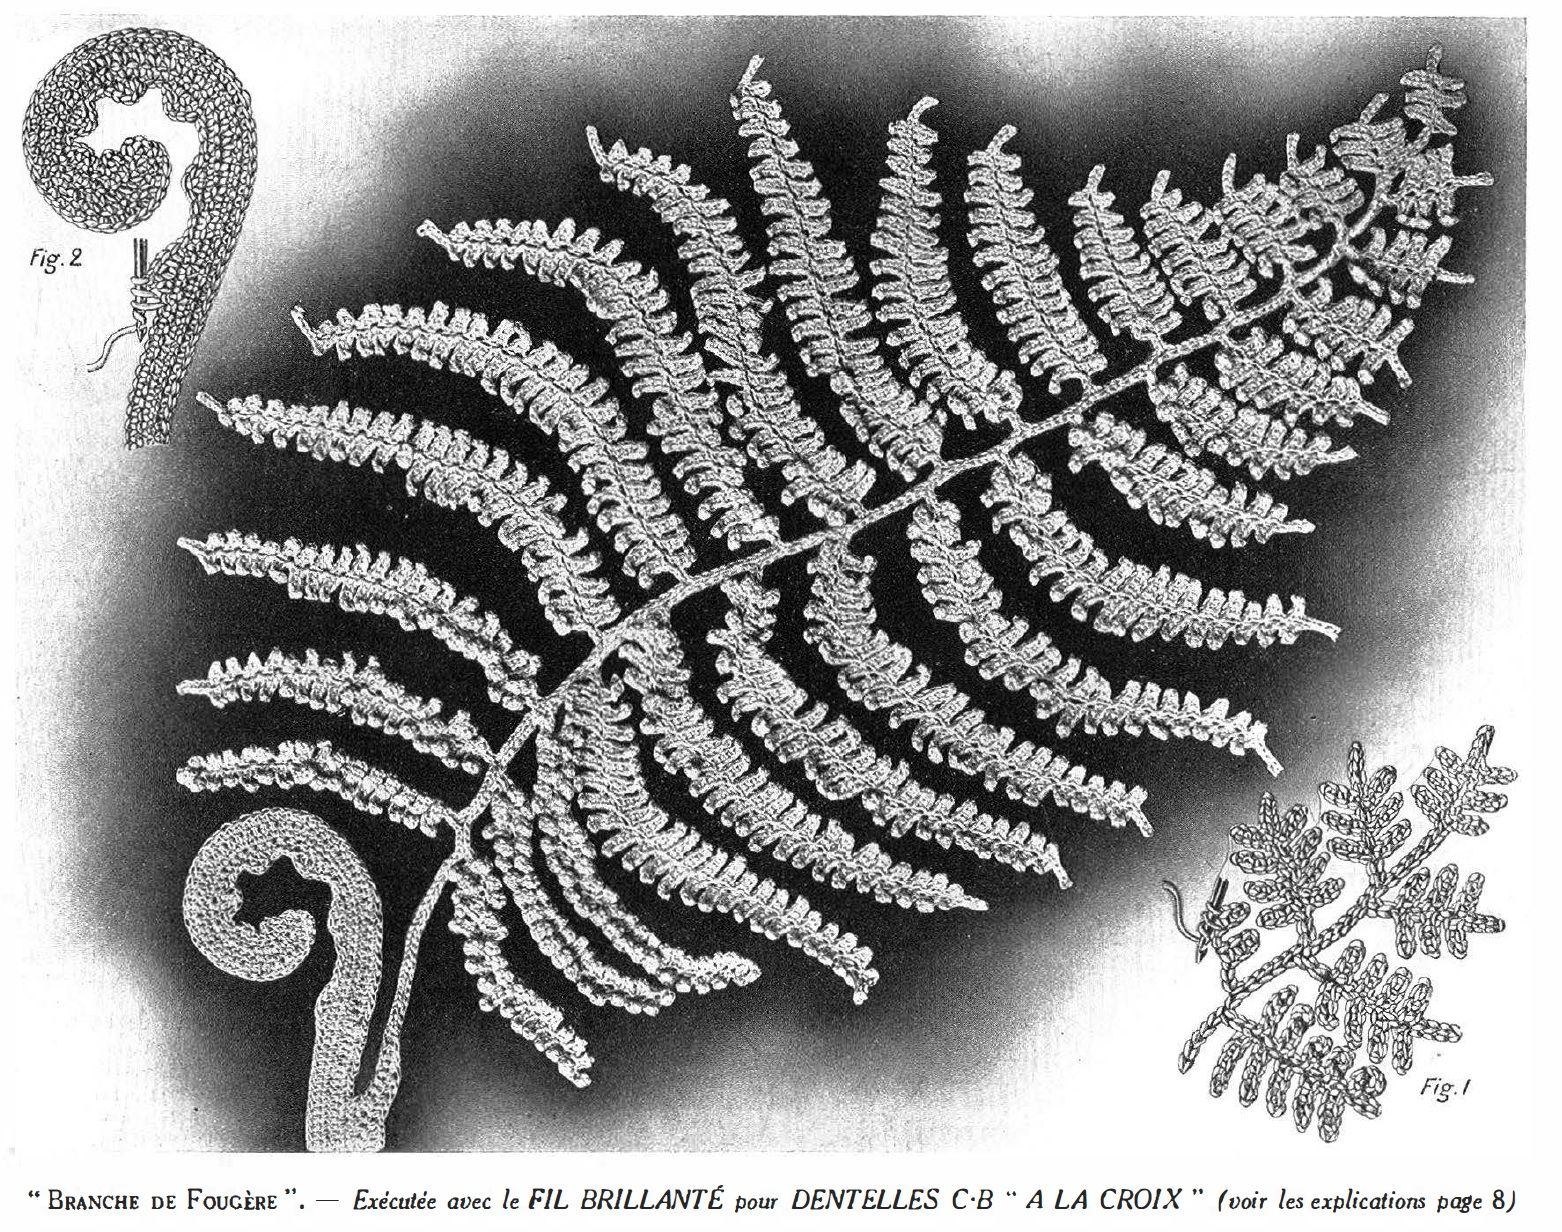 Crochet Fern Leaf | CrochetHolic - HilariaFina | Pinterest | Irisch ...